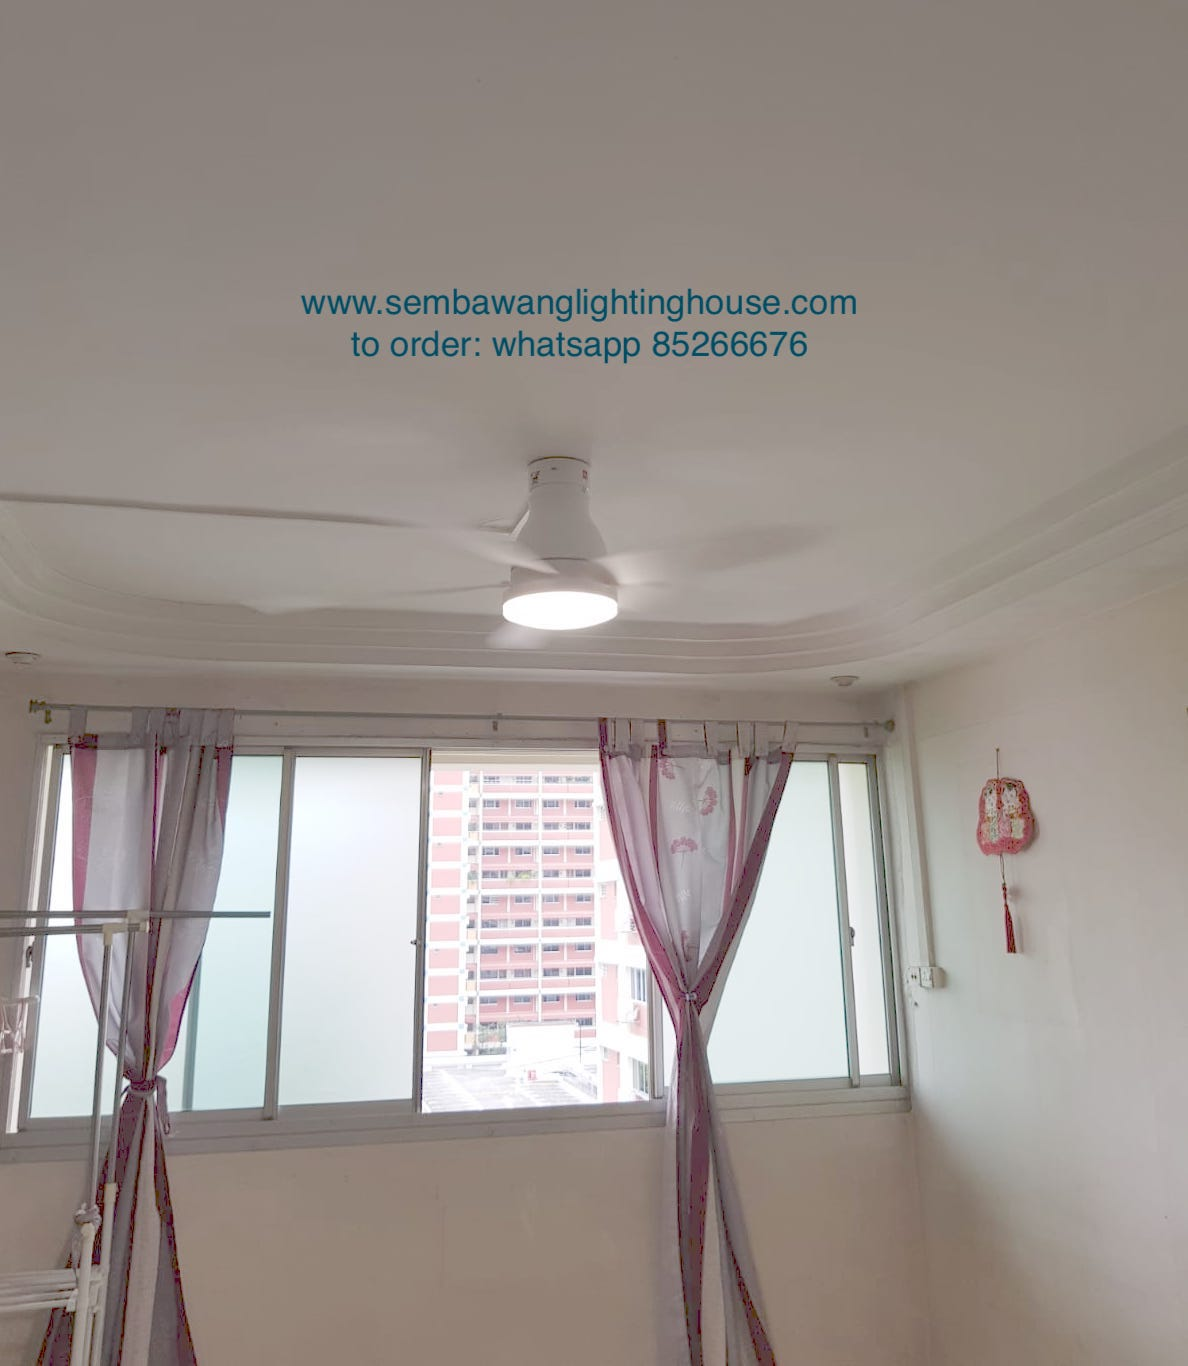 kdk-u60fw-white-ceiling-fan-sembawang-lighting-house-sample-02.jpg